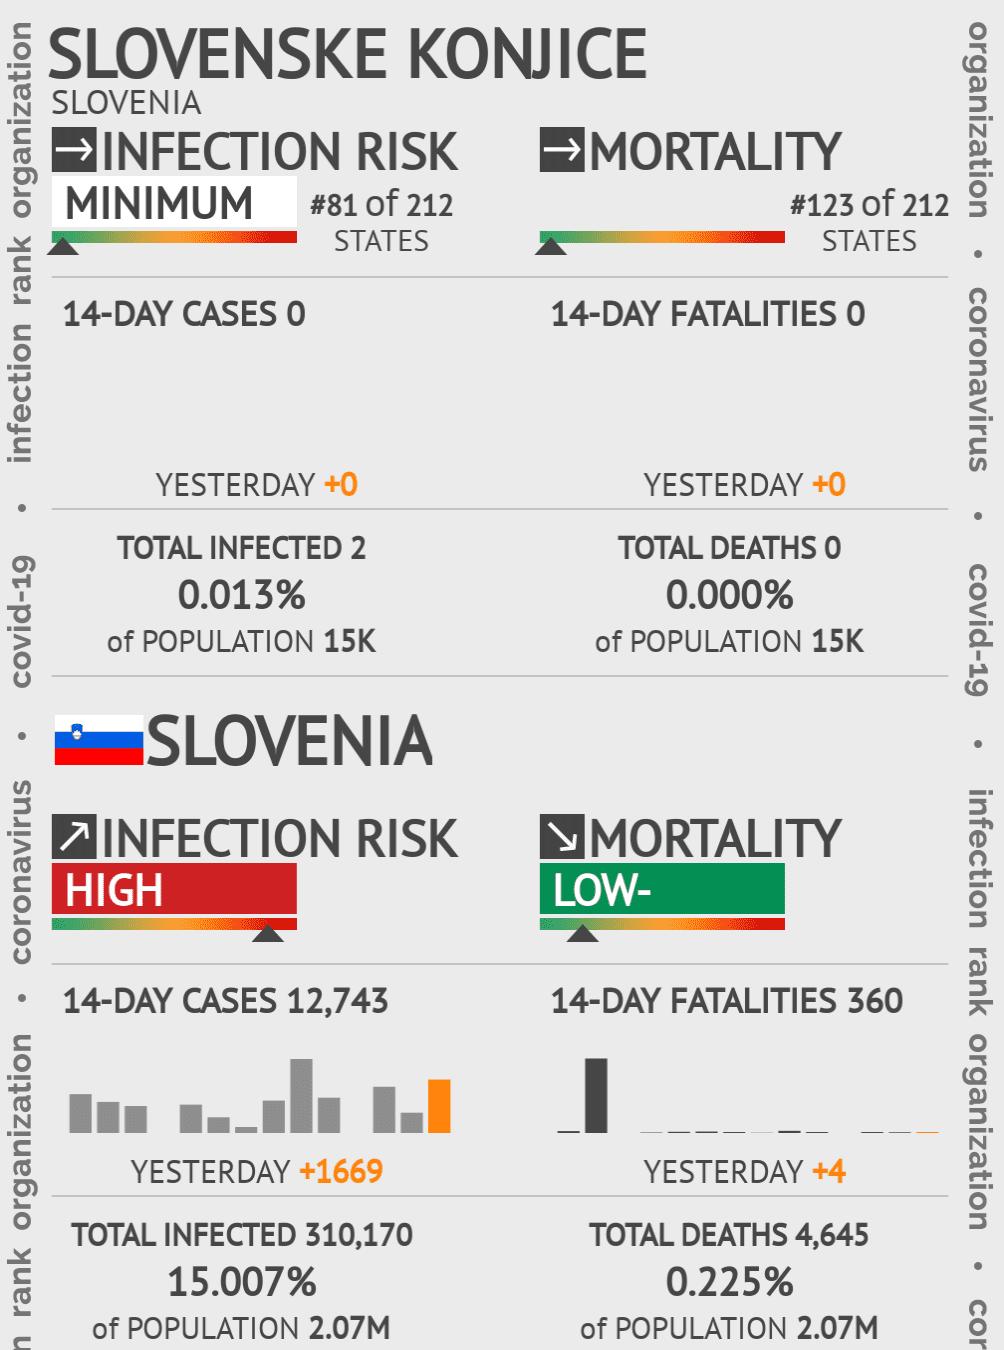 Slovenske Konjice Coronavirus Covid-19 Risk of Infection on May 14, 2020